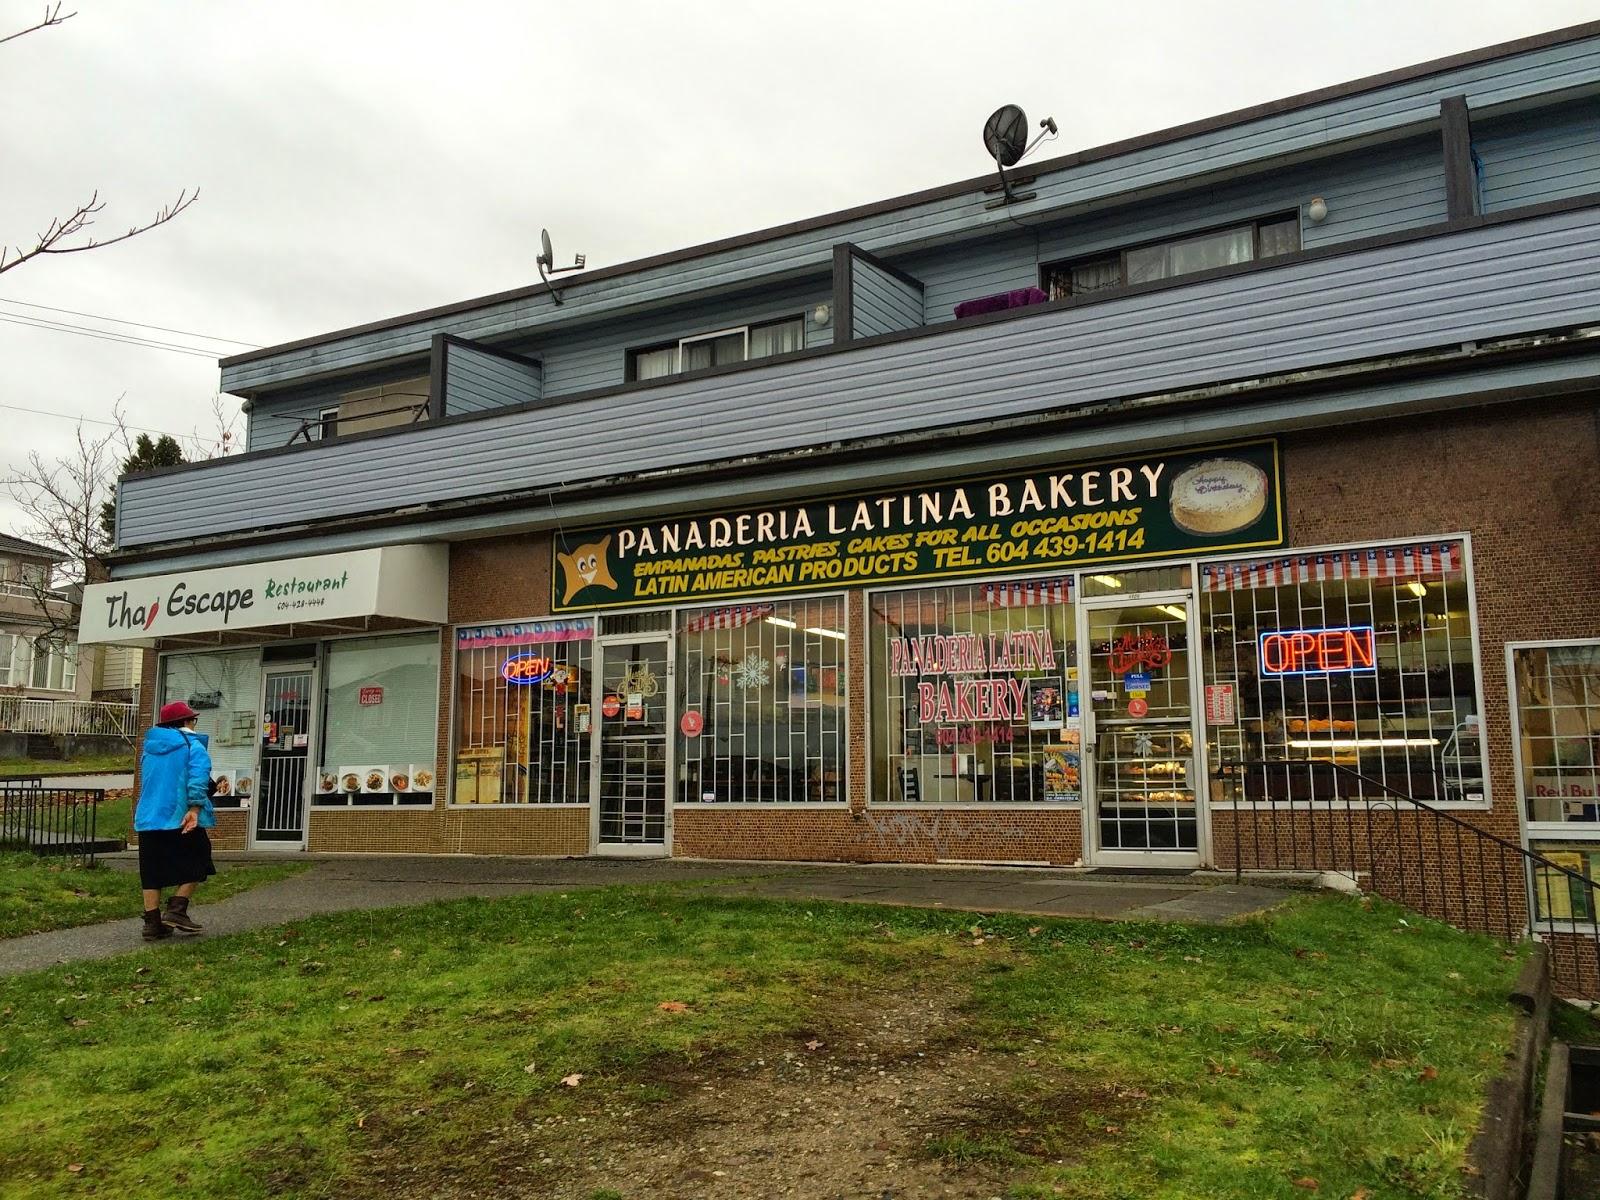 Adventures of EdRocker: Panaderia Latina Bakery